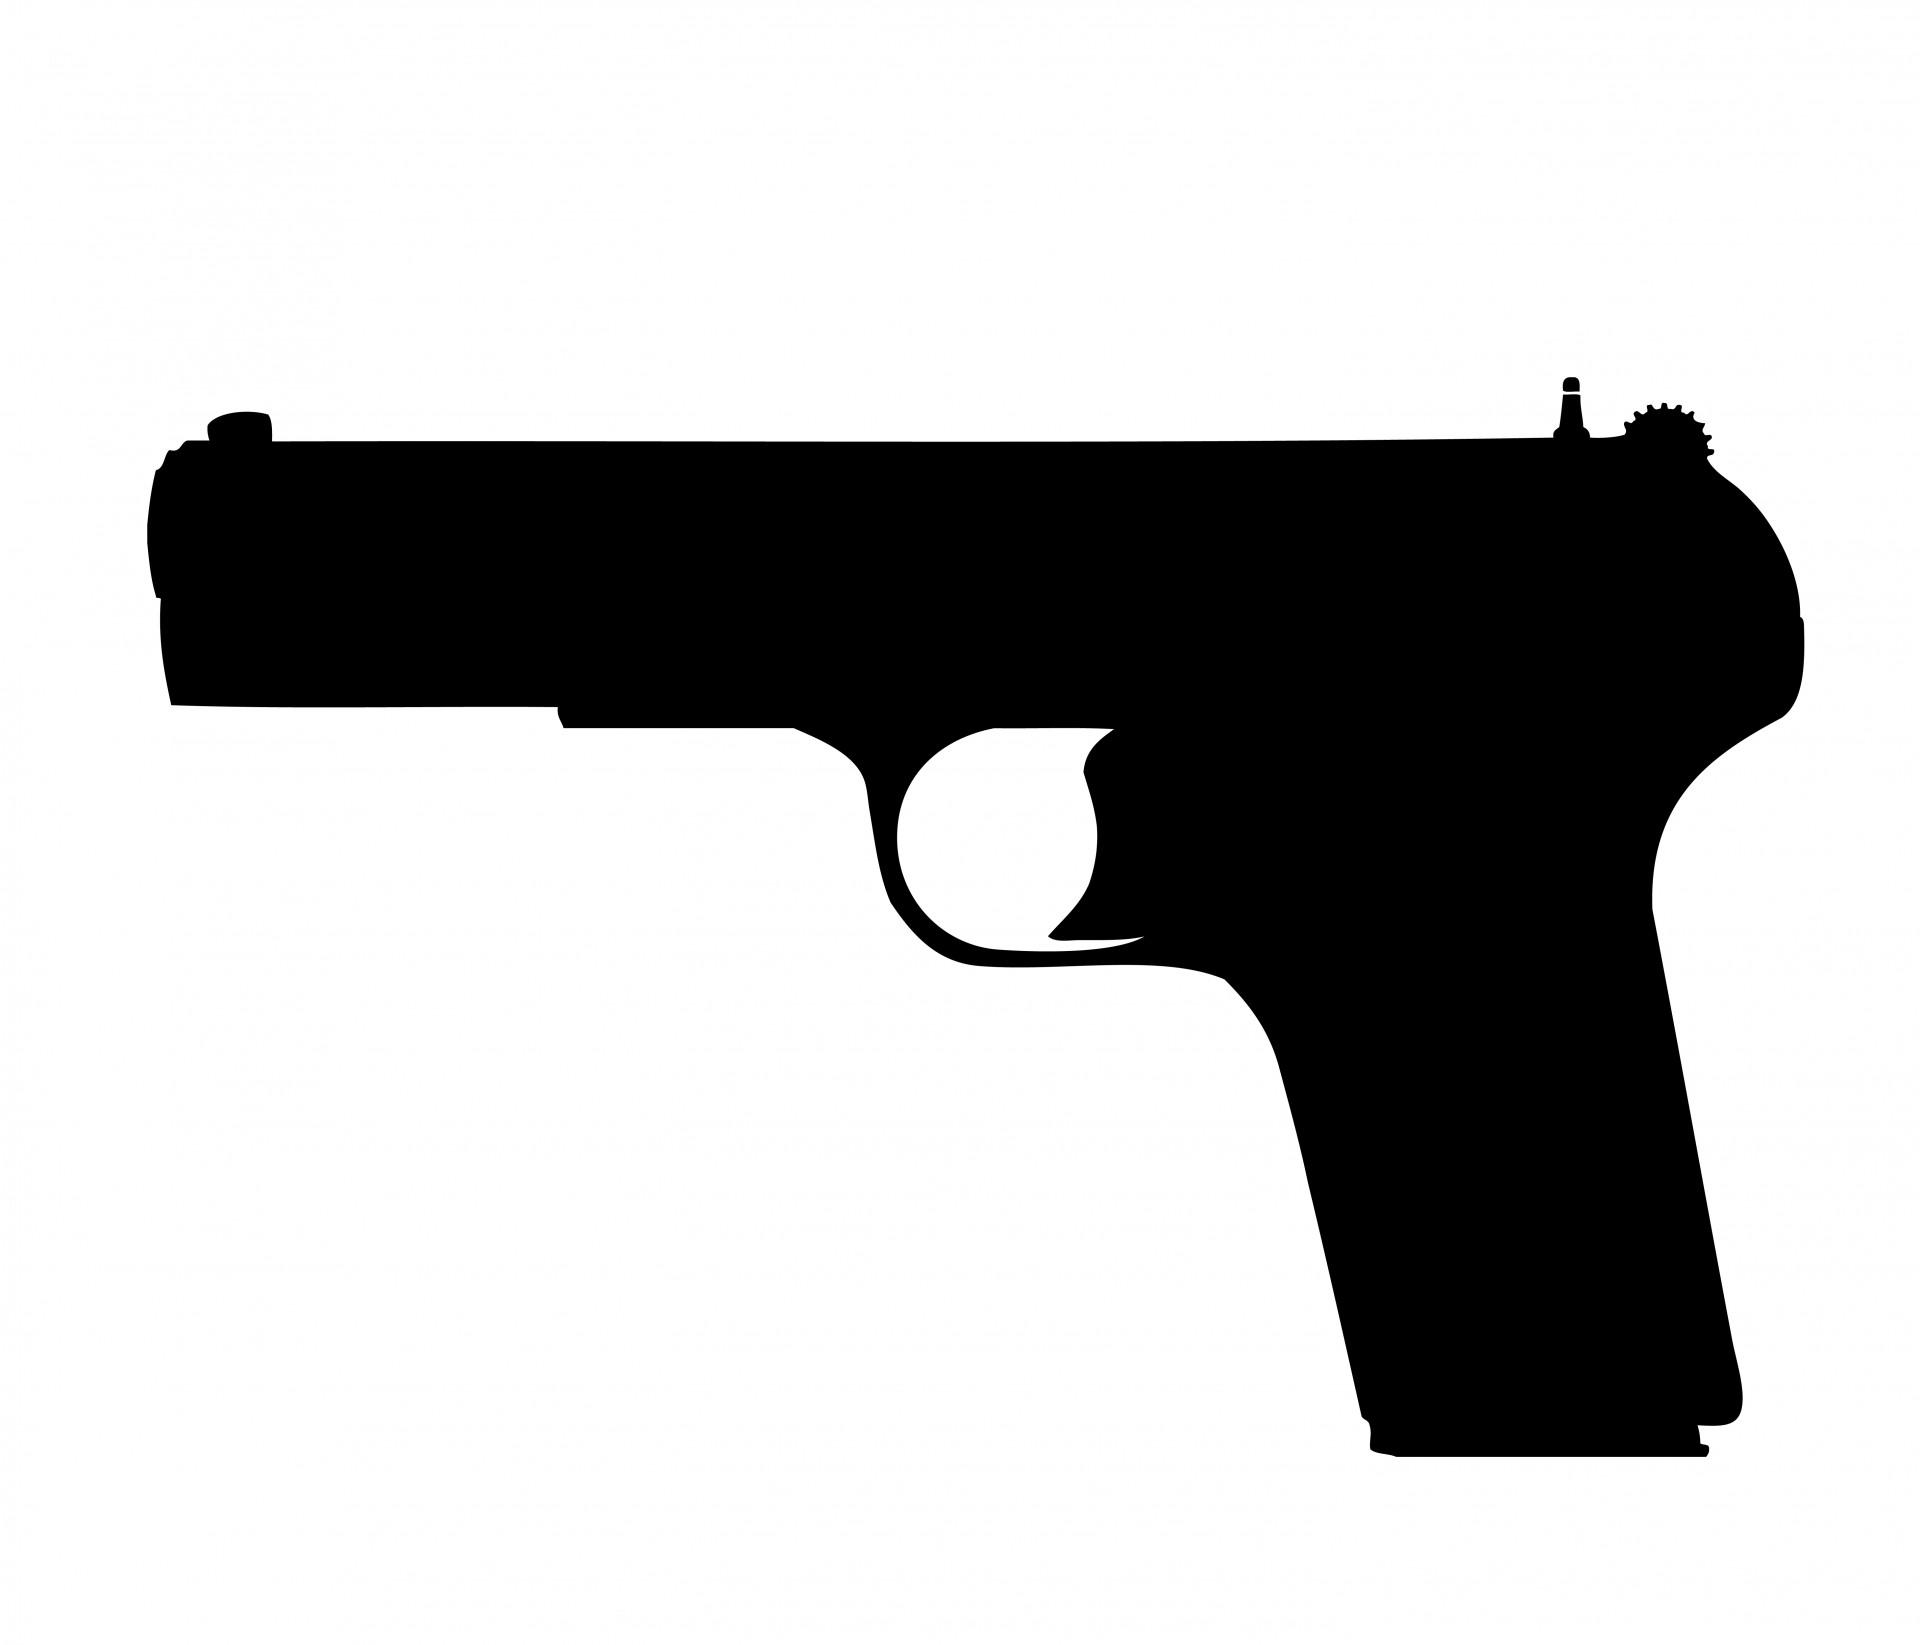 Guns clip art - ClipartFest-Guns clip art - ClipartFest-1